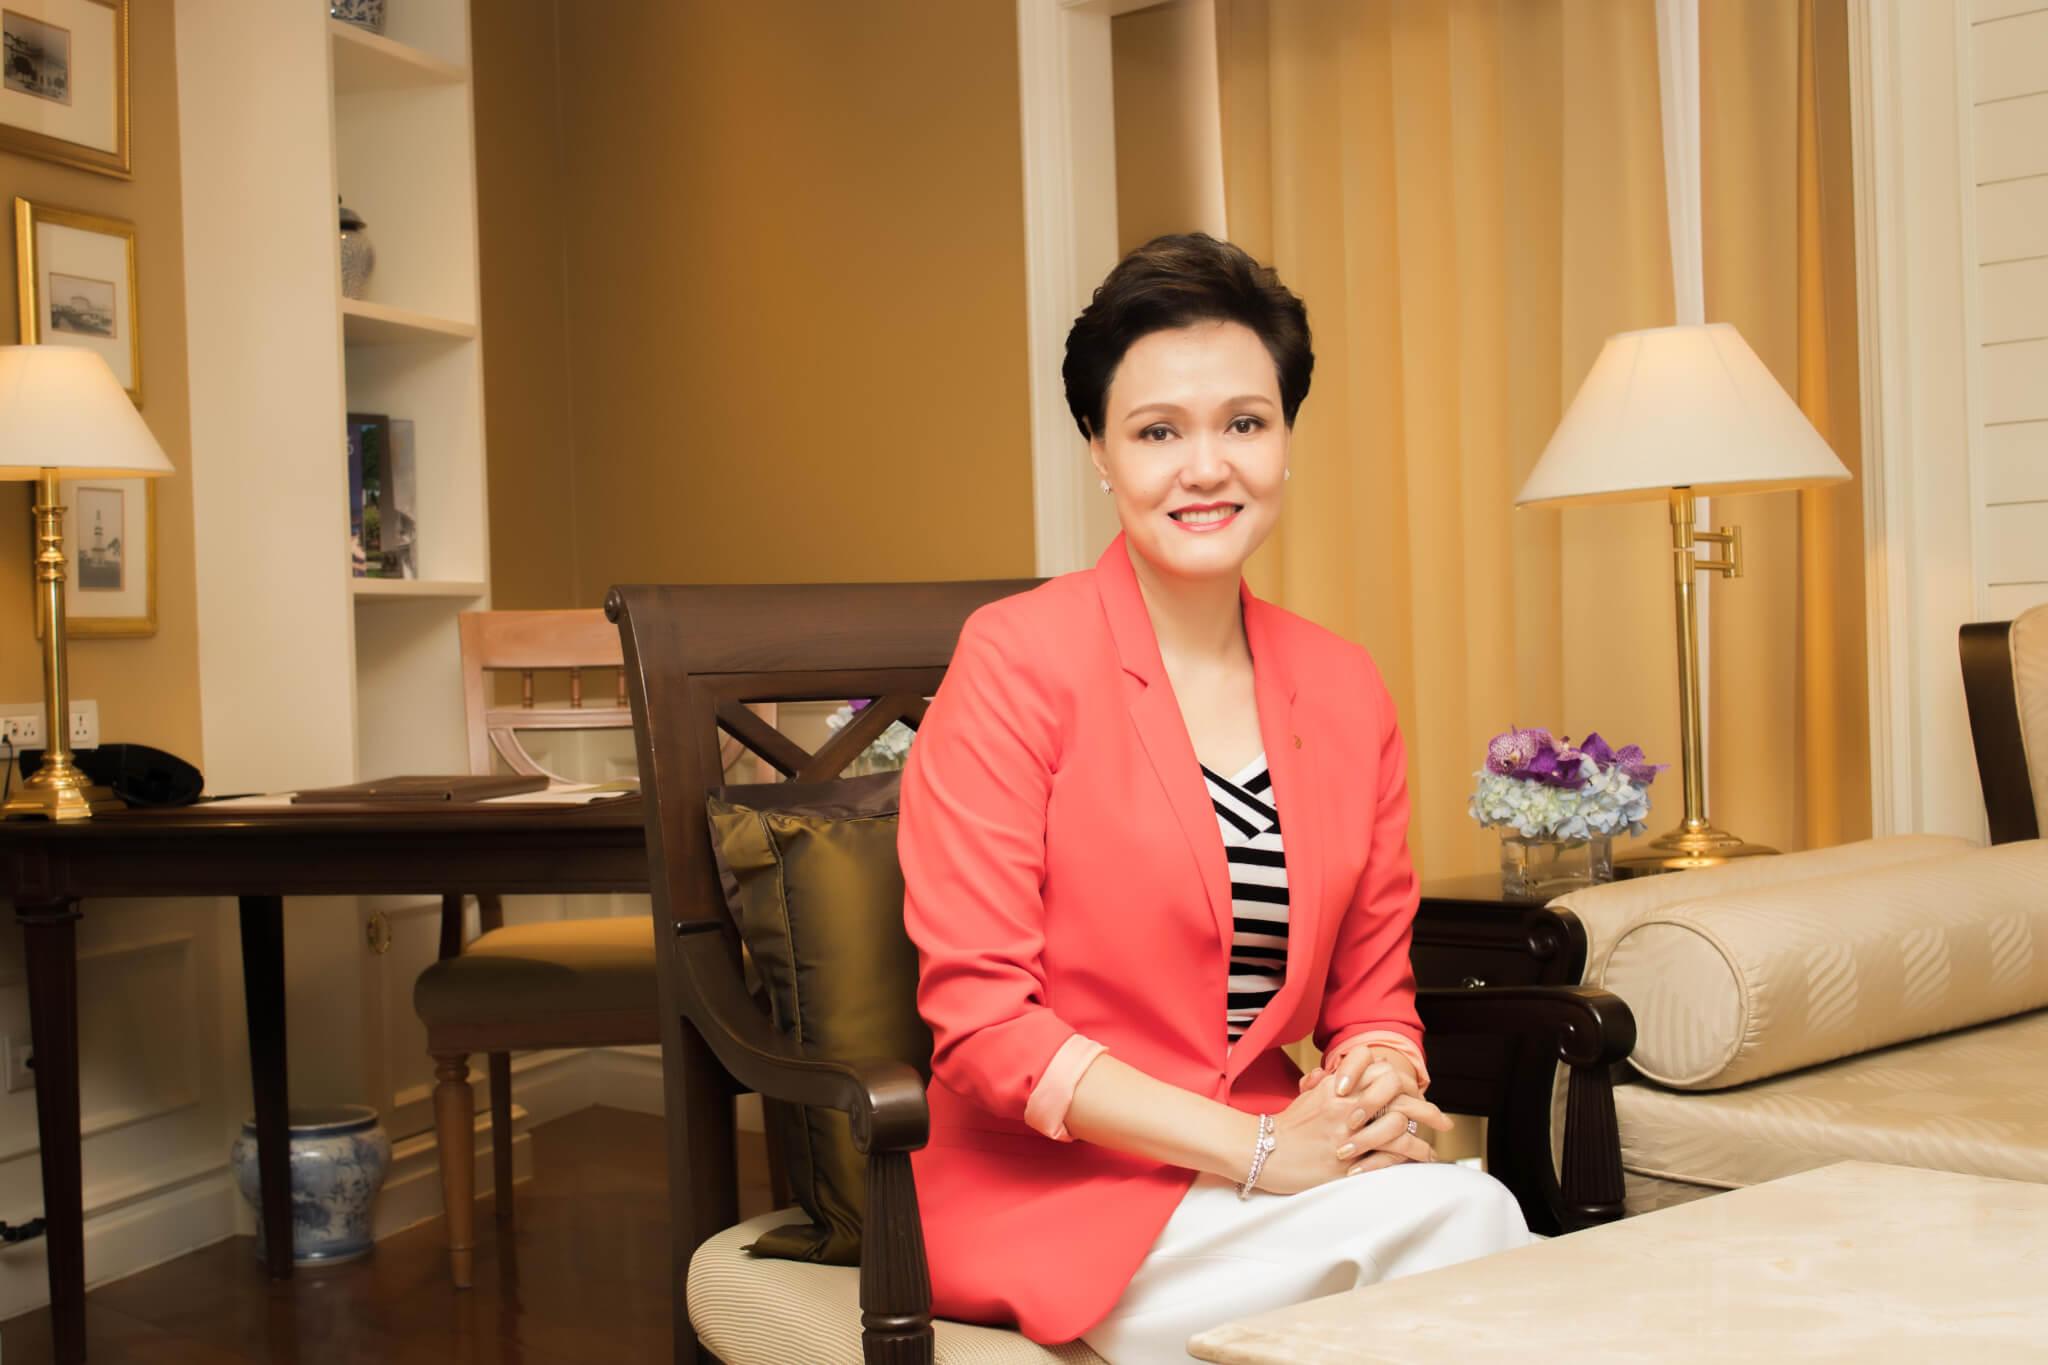 Dusit Princess Boracay: The 2021 countdown